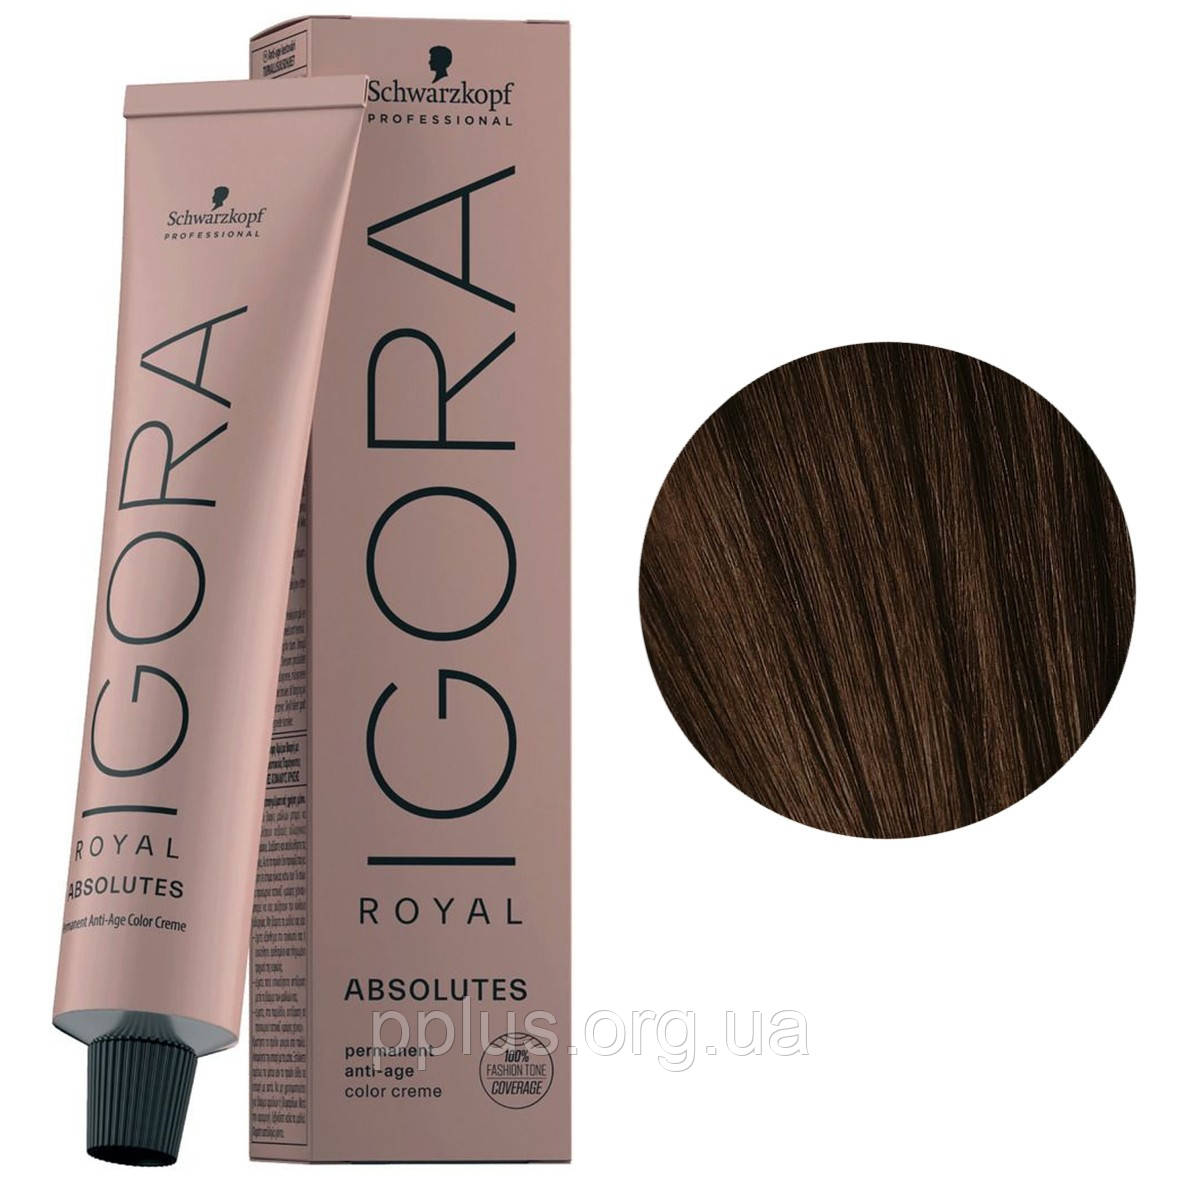 Фарба для волосся 4-50 Schwarzkopf Igora Royal Absolutes Середньо-коричневий, золотисто-натур. 60 мл